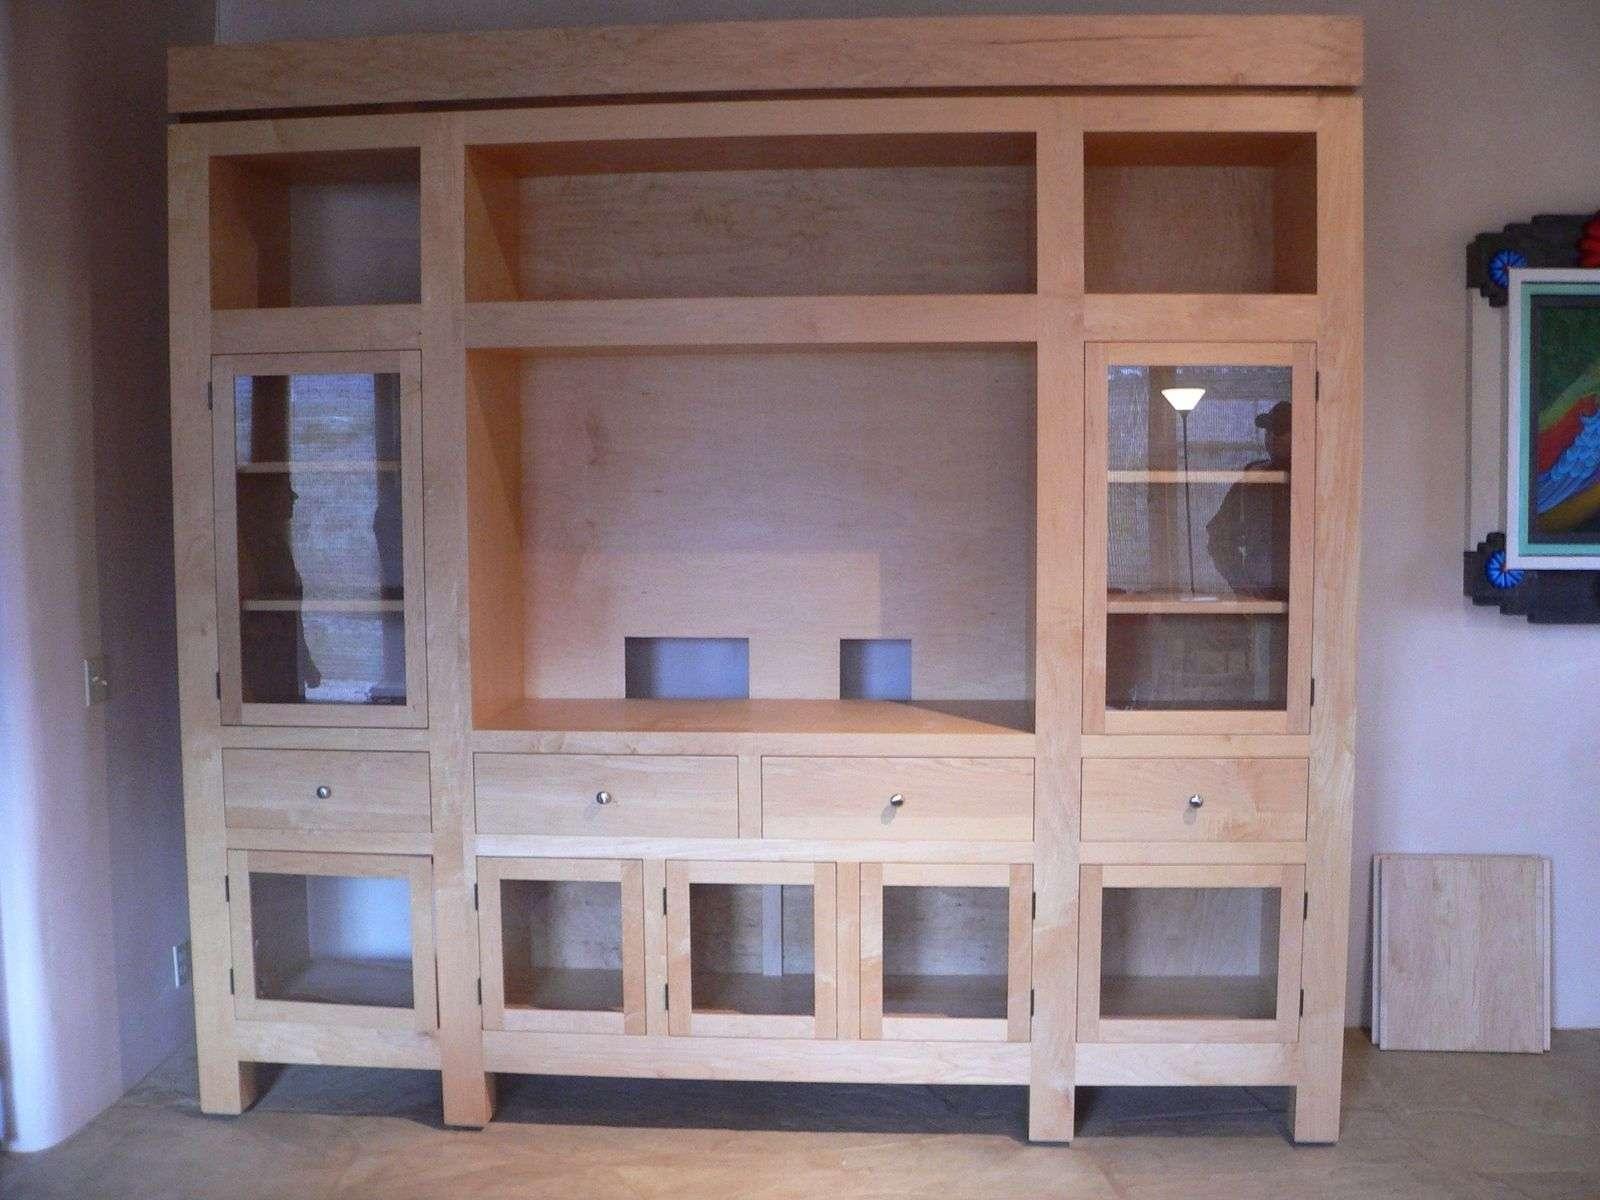 Custom Diy Unfinished Oak Tv Stand Cabinet With Glass Door Drawer Regarding Oak Tv Cabinets With Doors (View 3 of 20)